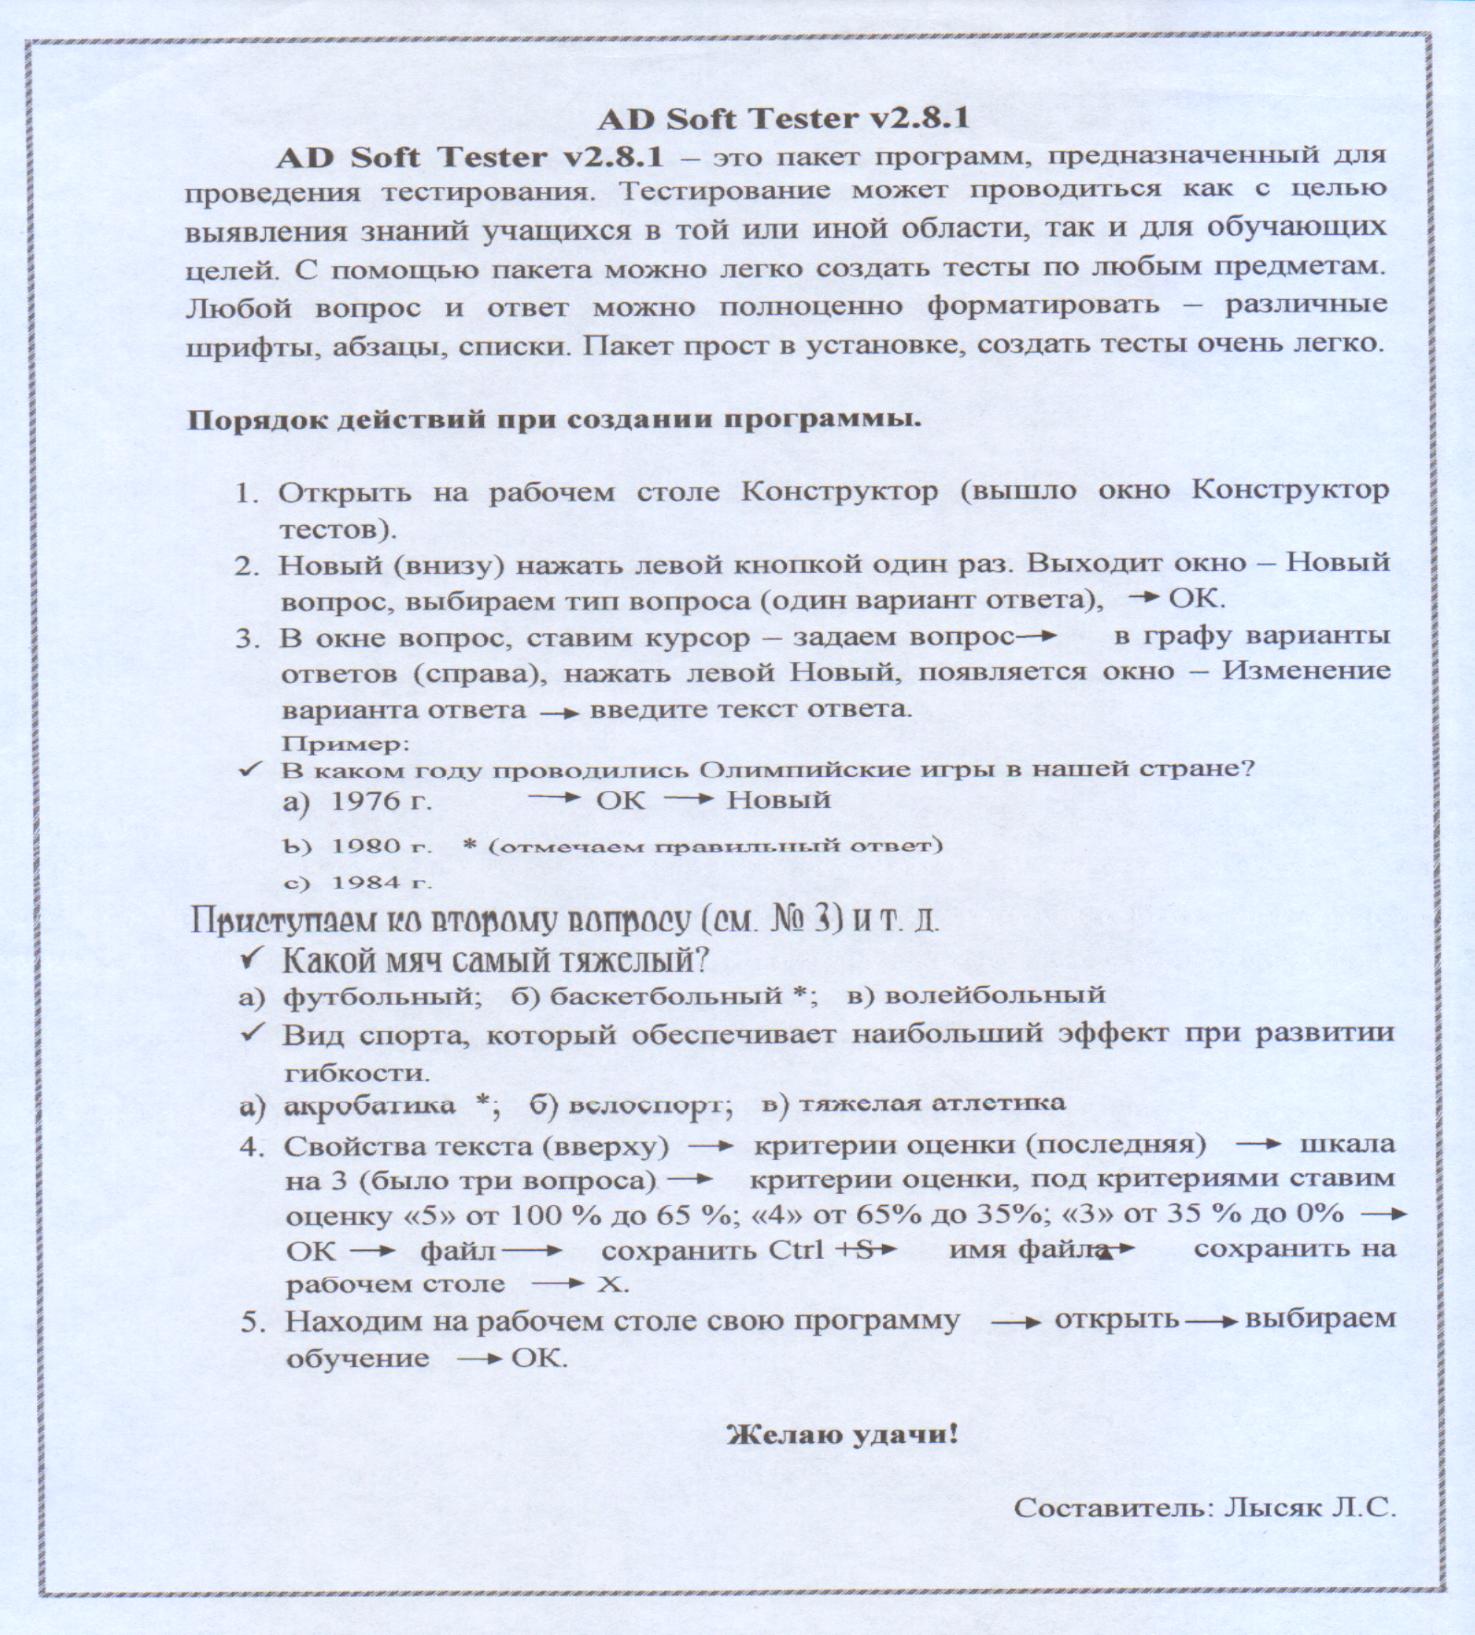 C:\Documents and Settings\Admin\Рабочий стол\программы-тест.bmp